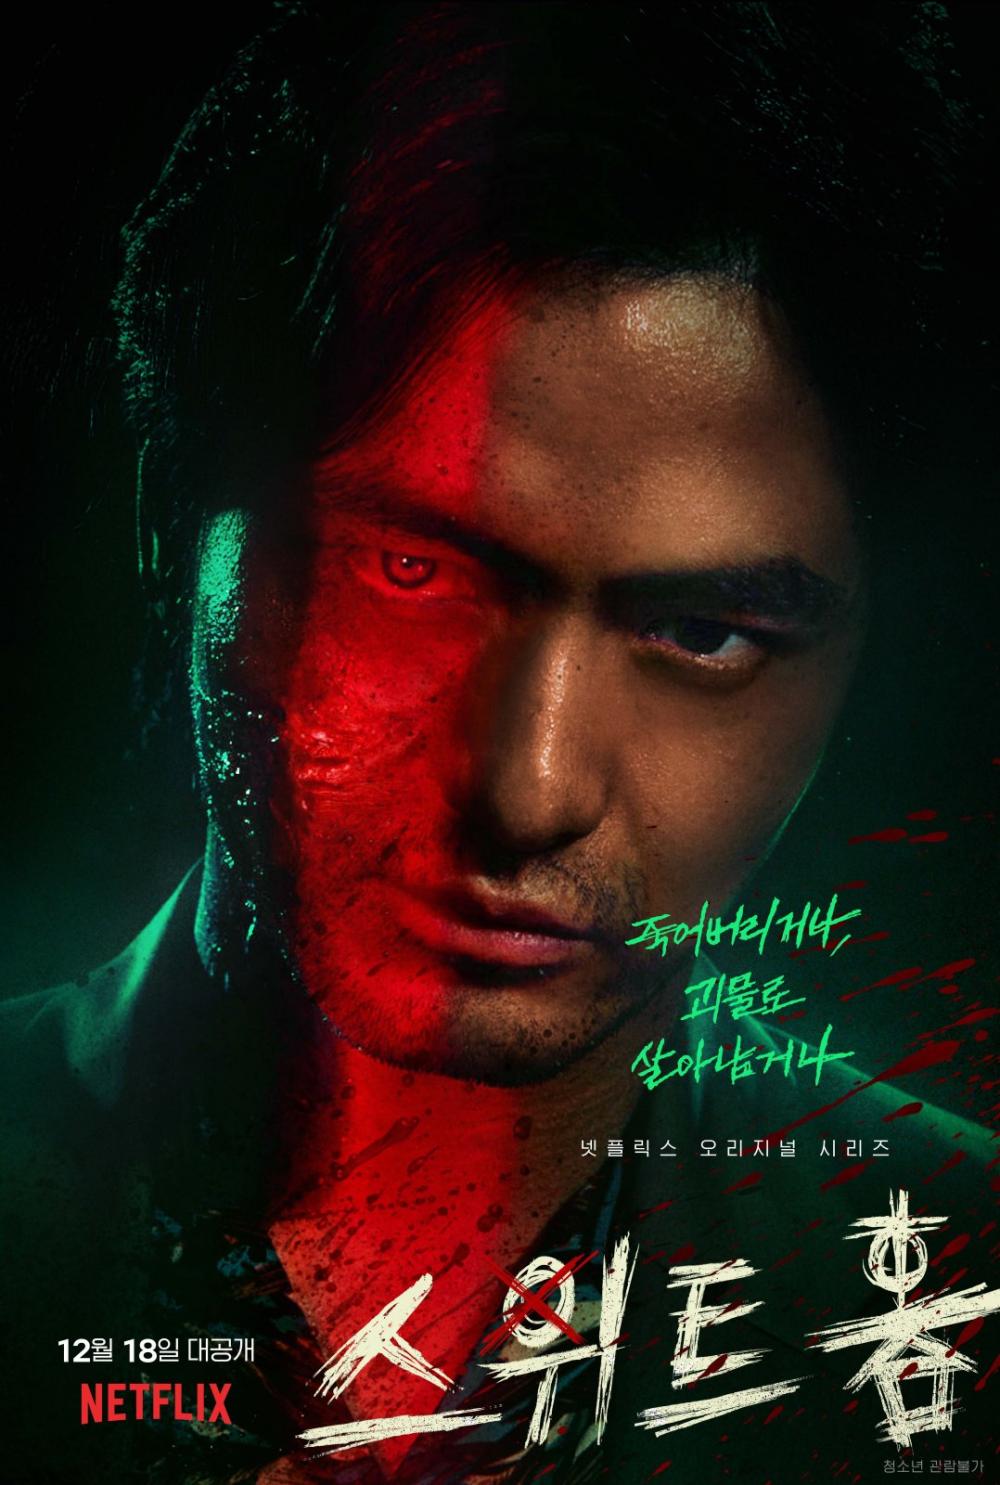 Sweet home trailer coming to netflix december 18, 2020. Lee Jin Wook Talks About How He Was Cast On The Hit Netflix Original Show Sweet Home Allkpop